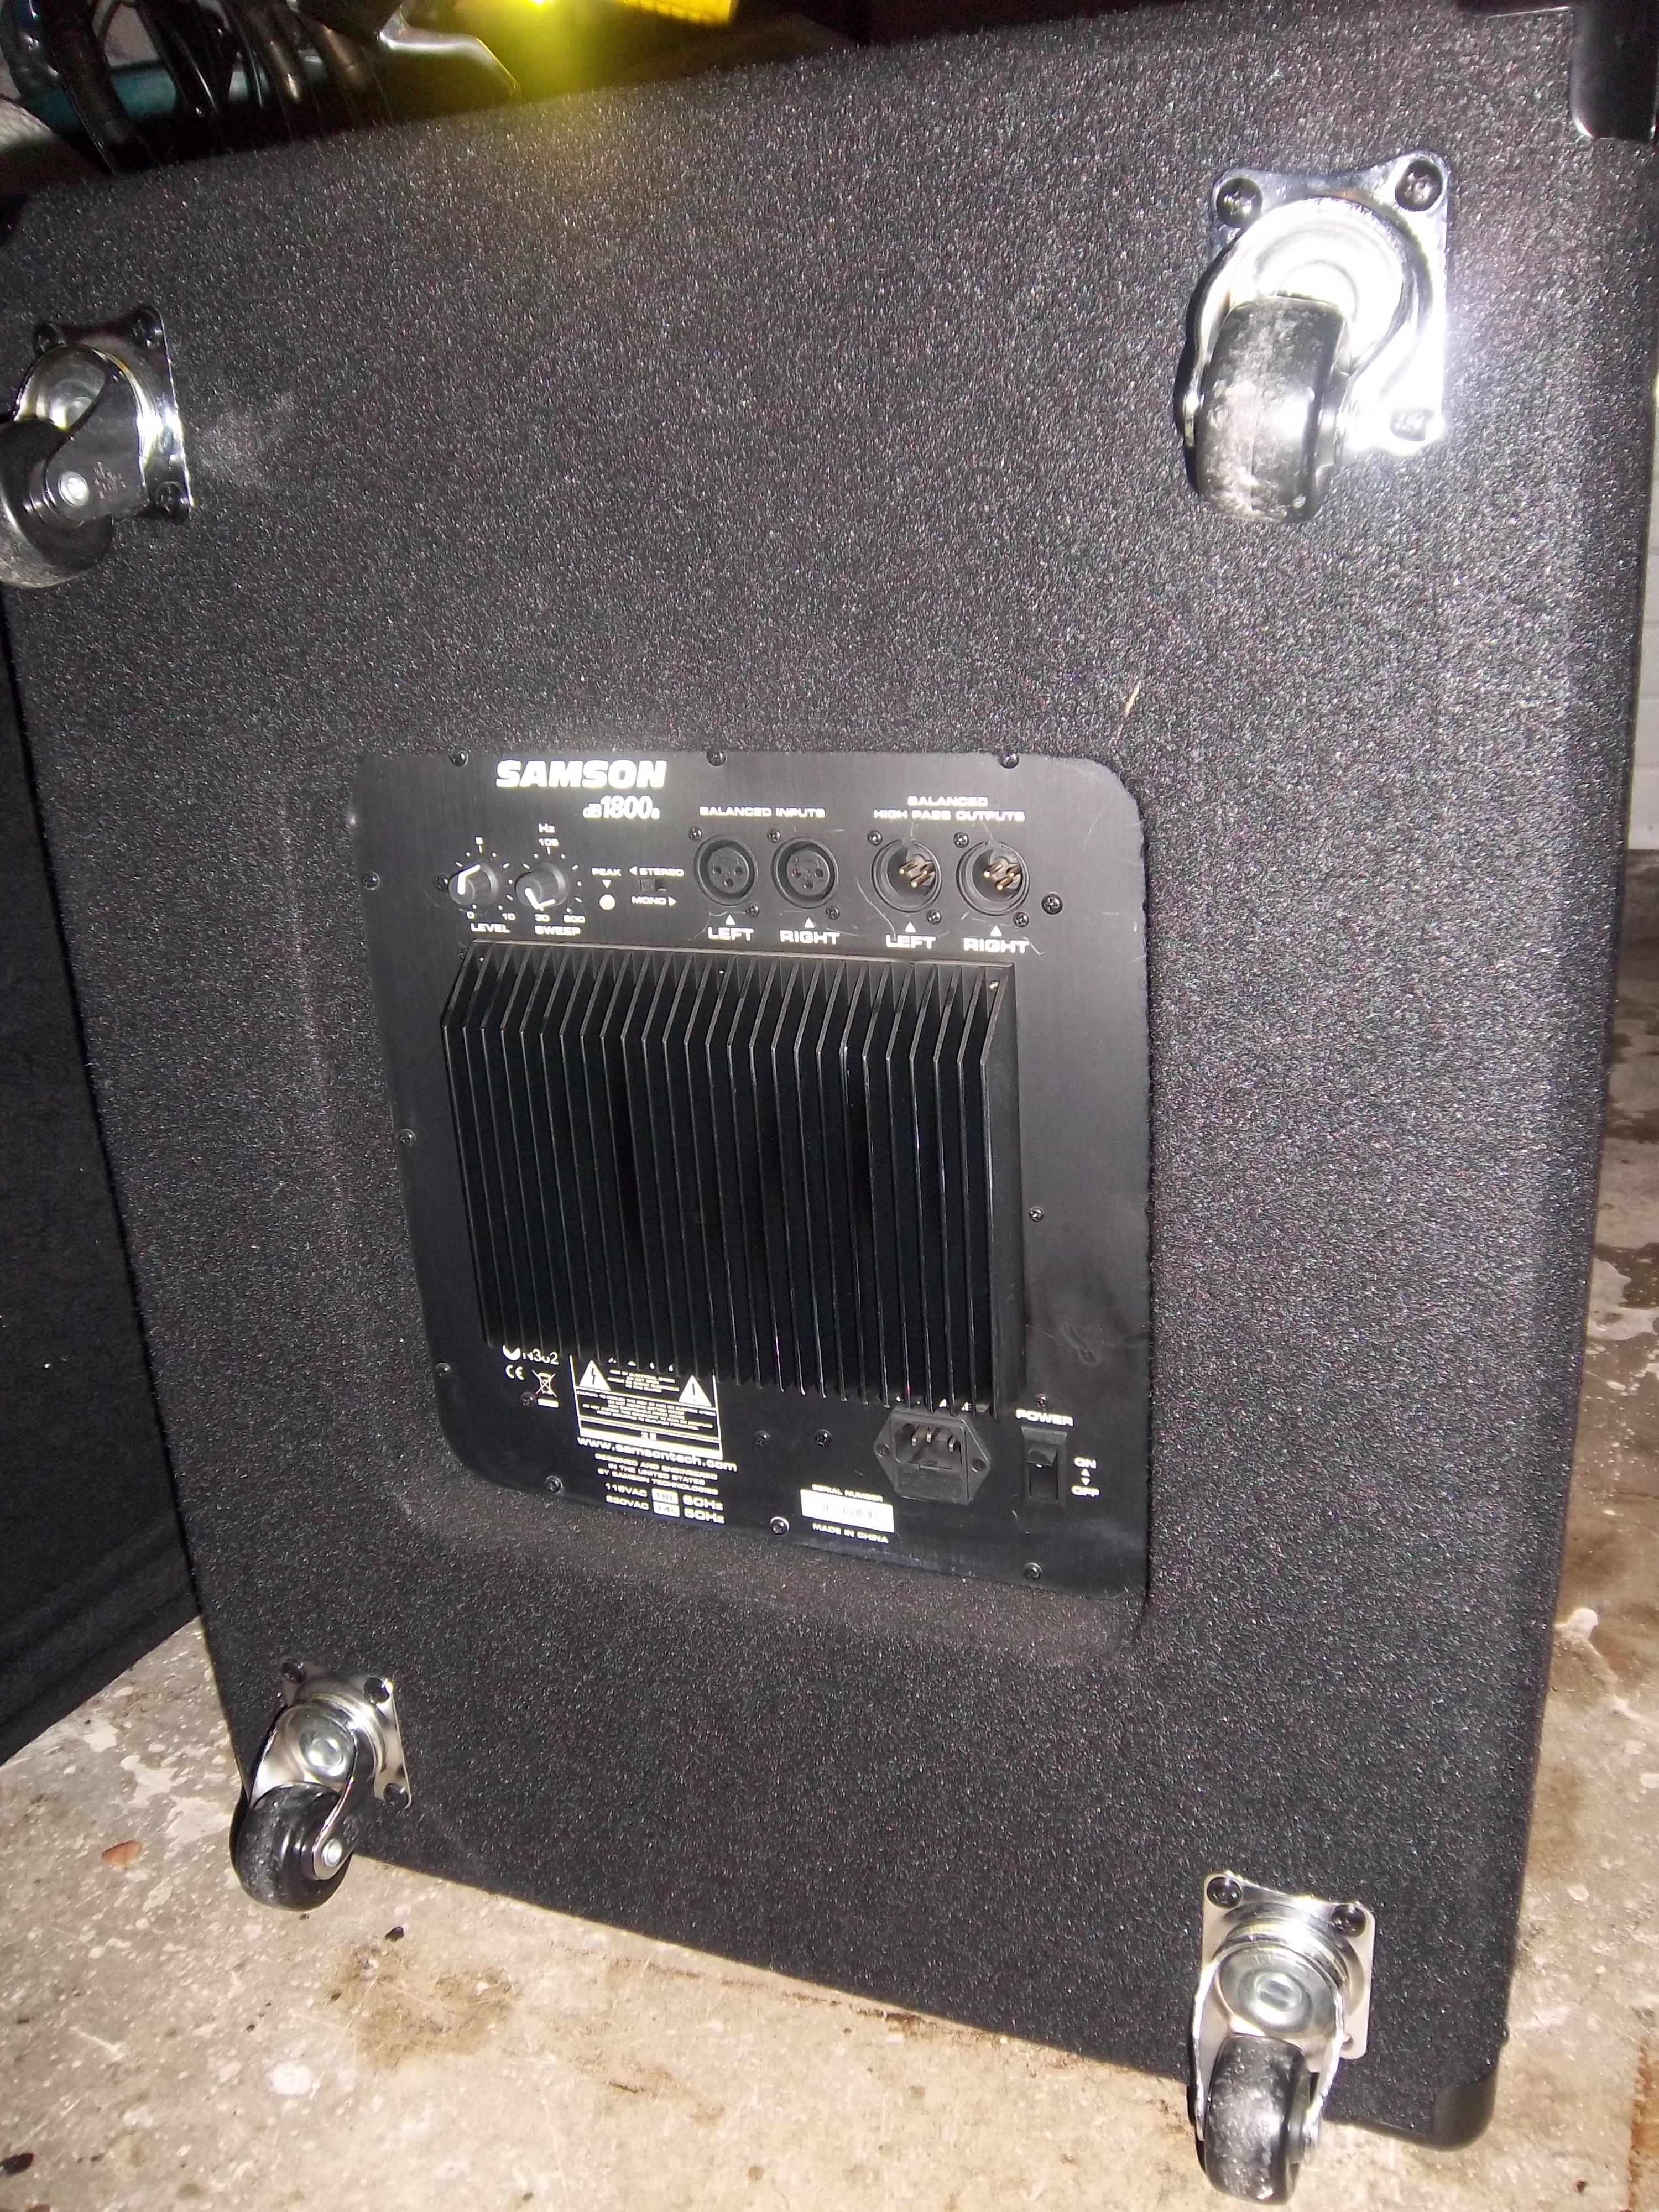 Samson Technologies DB1800a Image